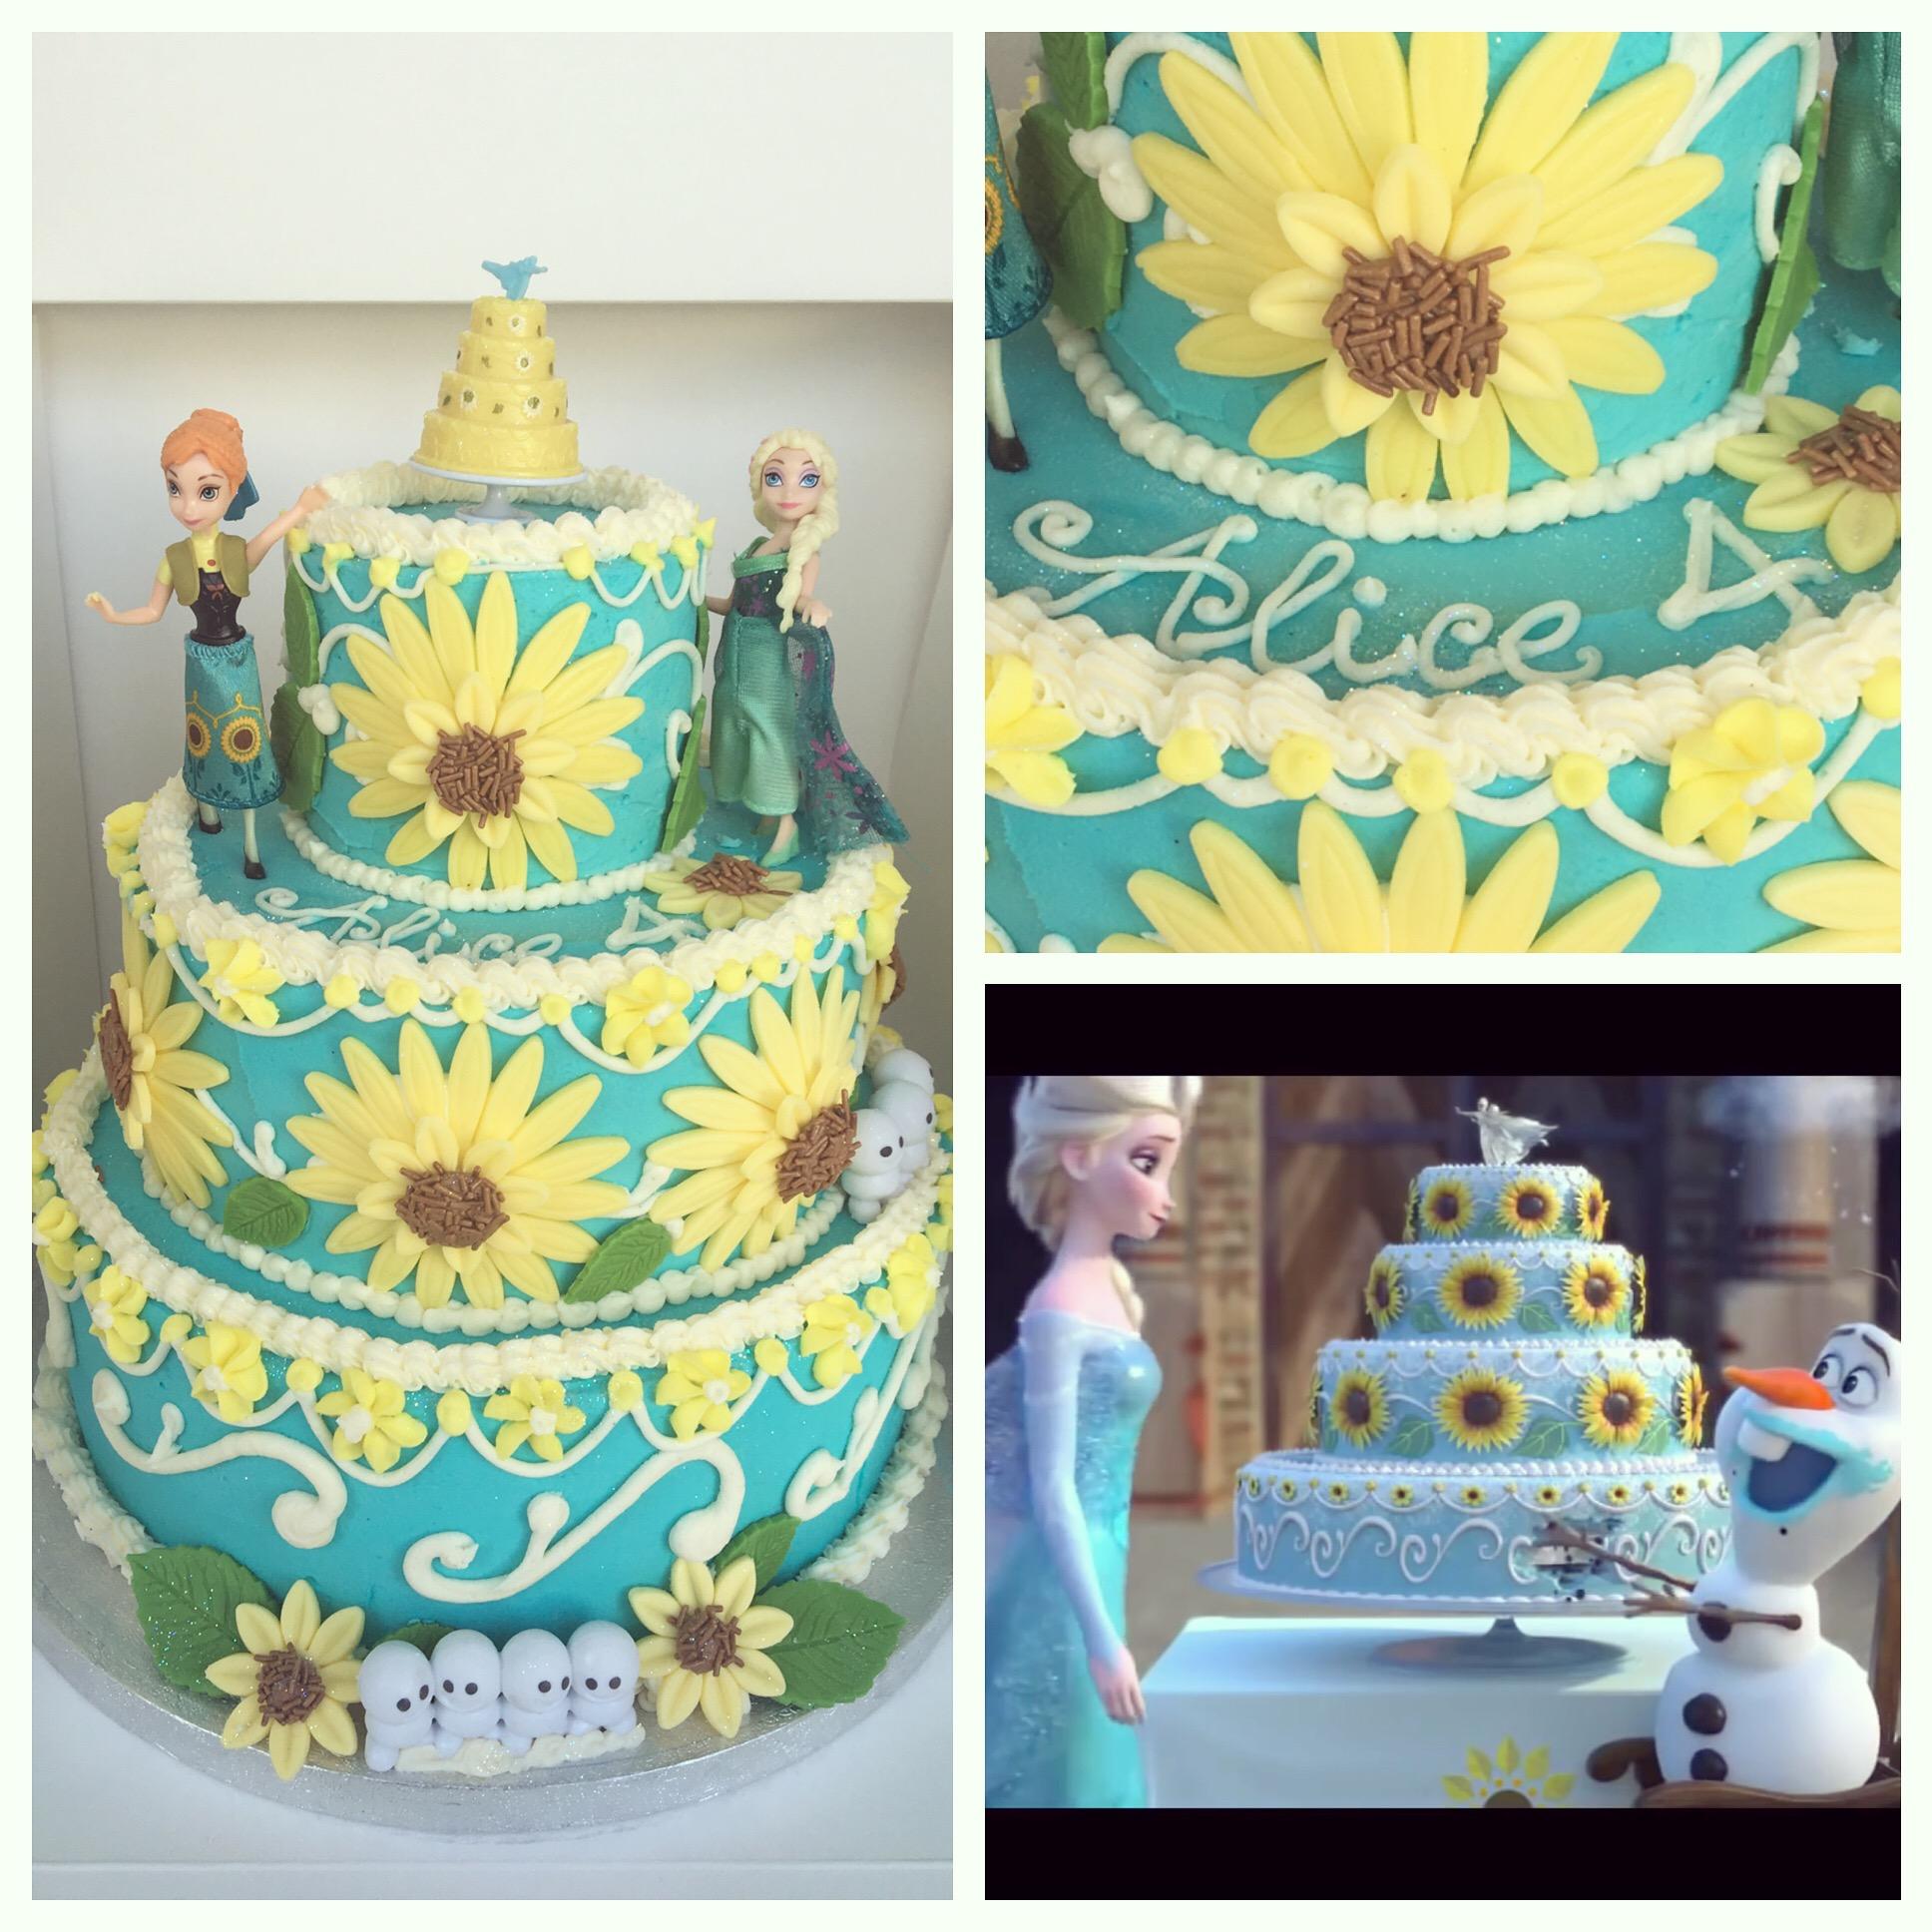 Frozen Fever Cake Happy 4th Birthday Alice Crumbs